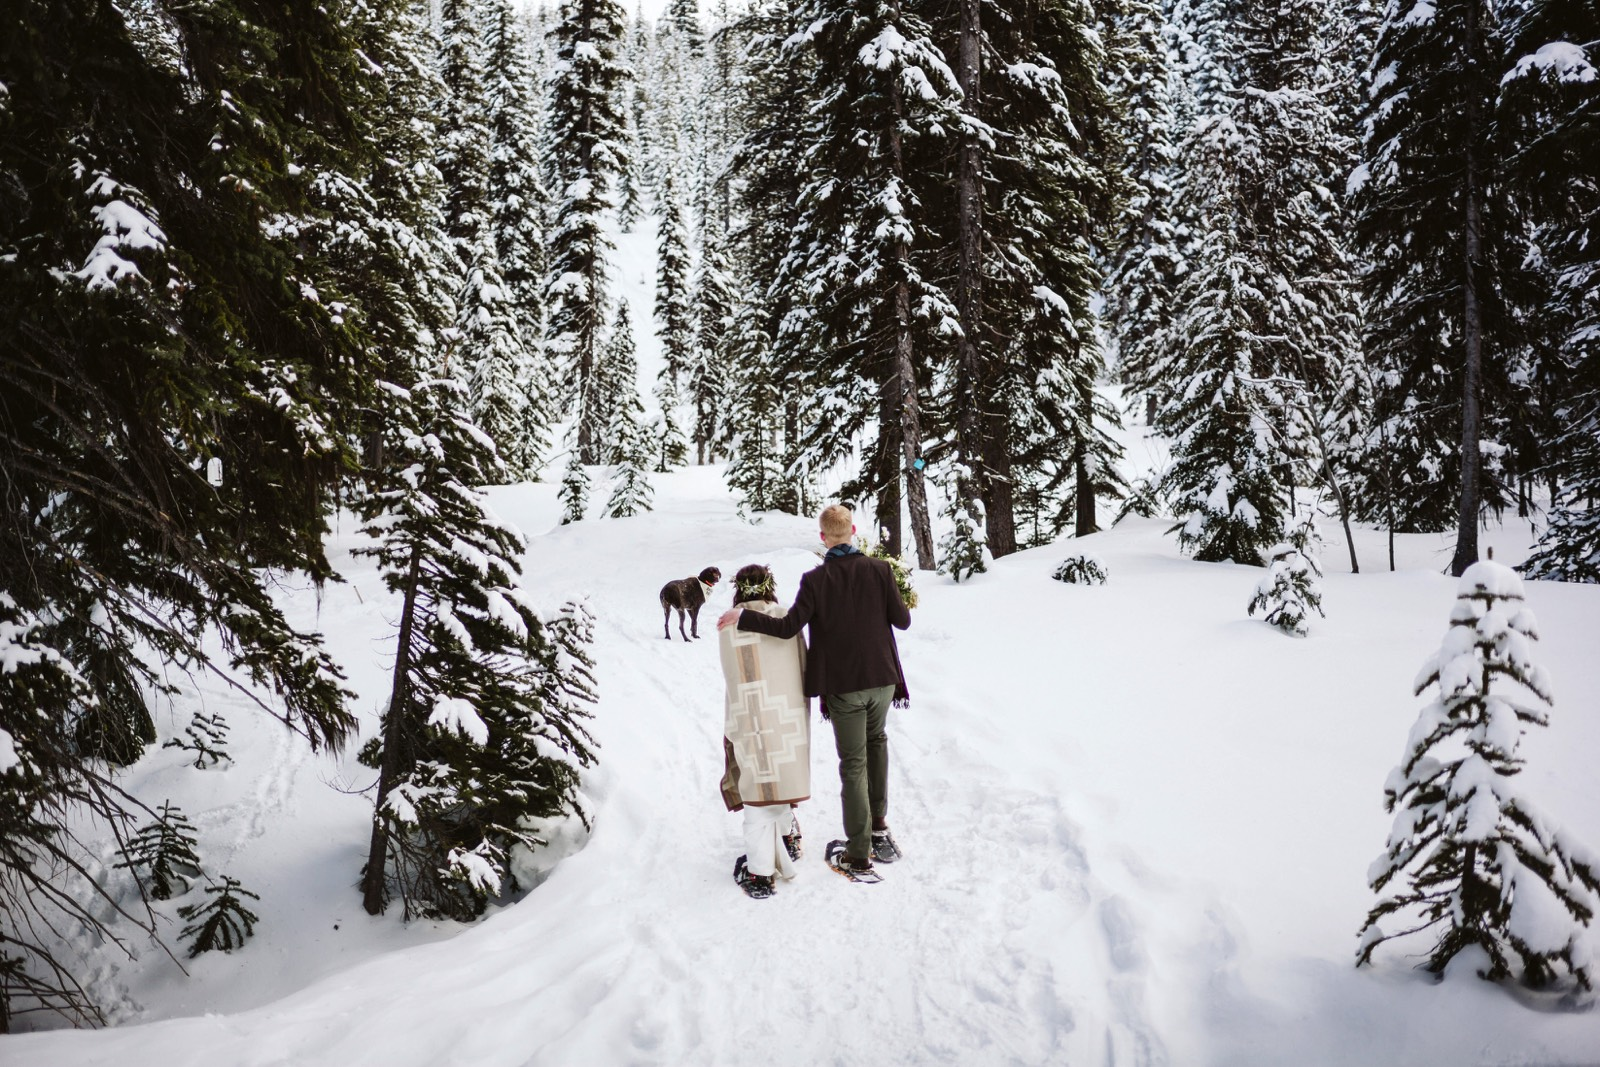 alpine-lakes-high-camp-winter-wedding-48 ALPINE LAKES HIGH CAMP WEDDING